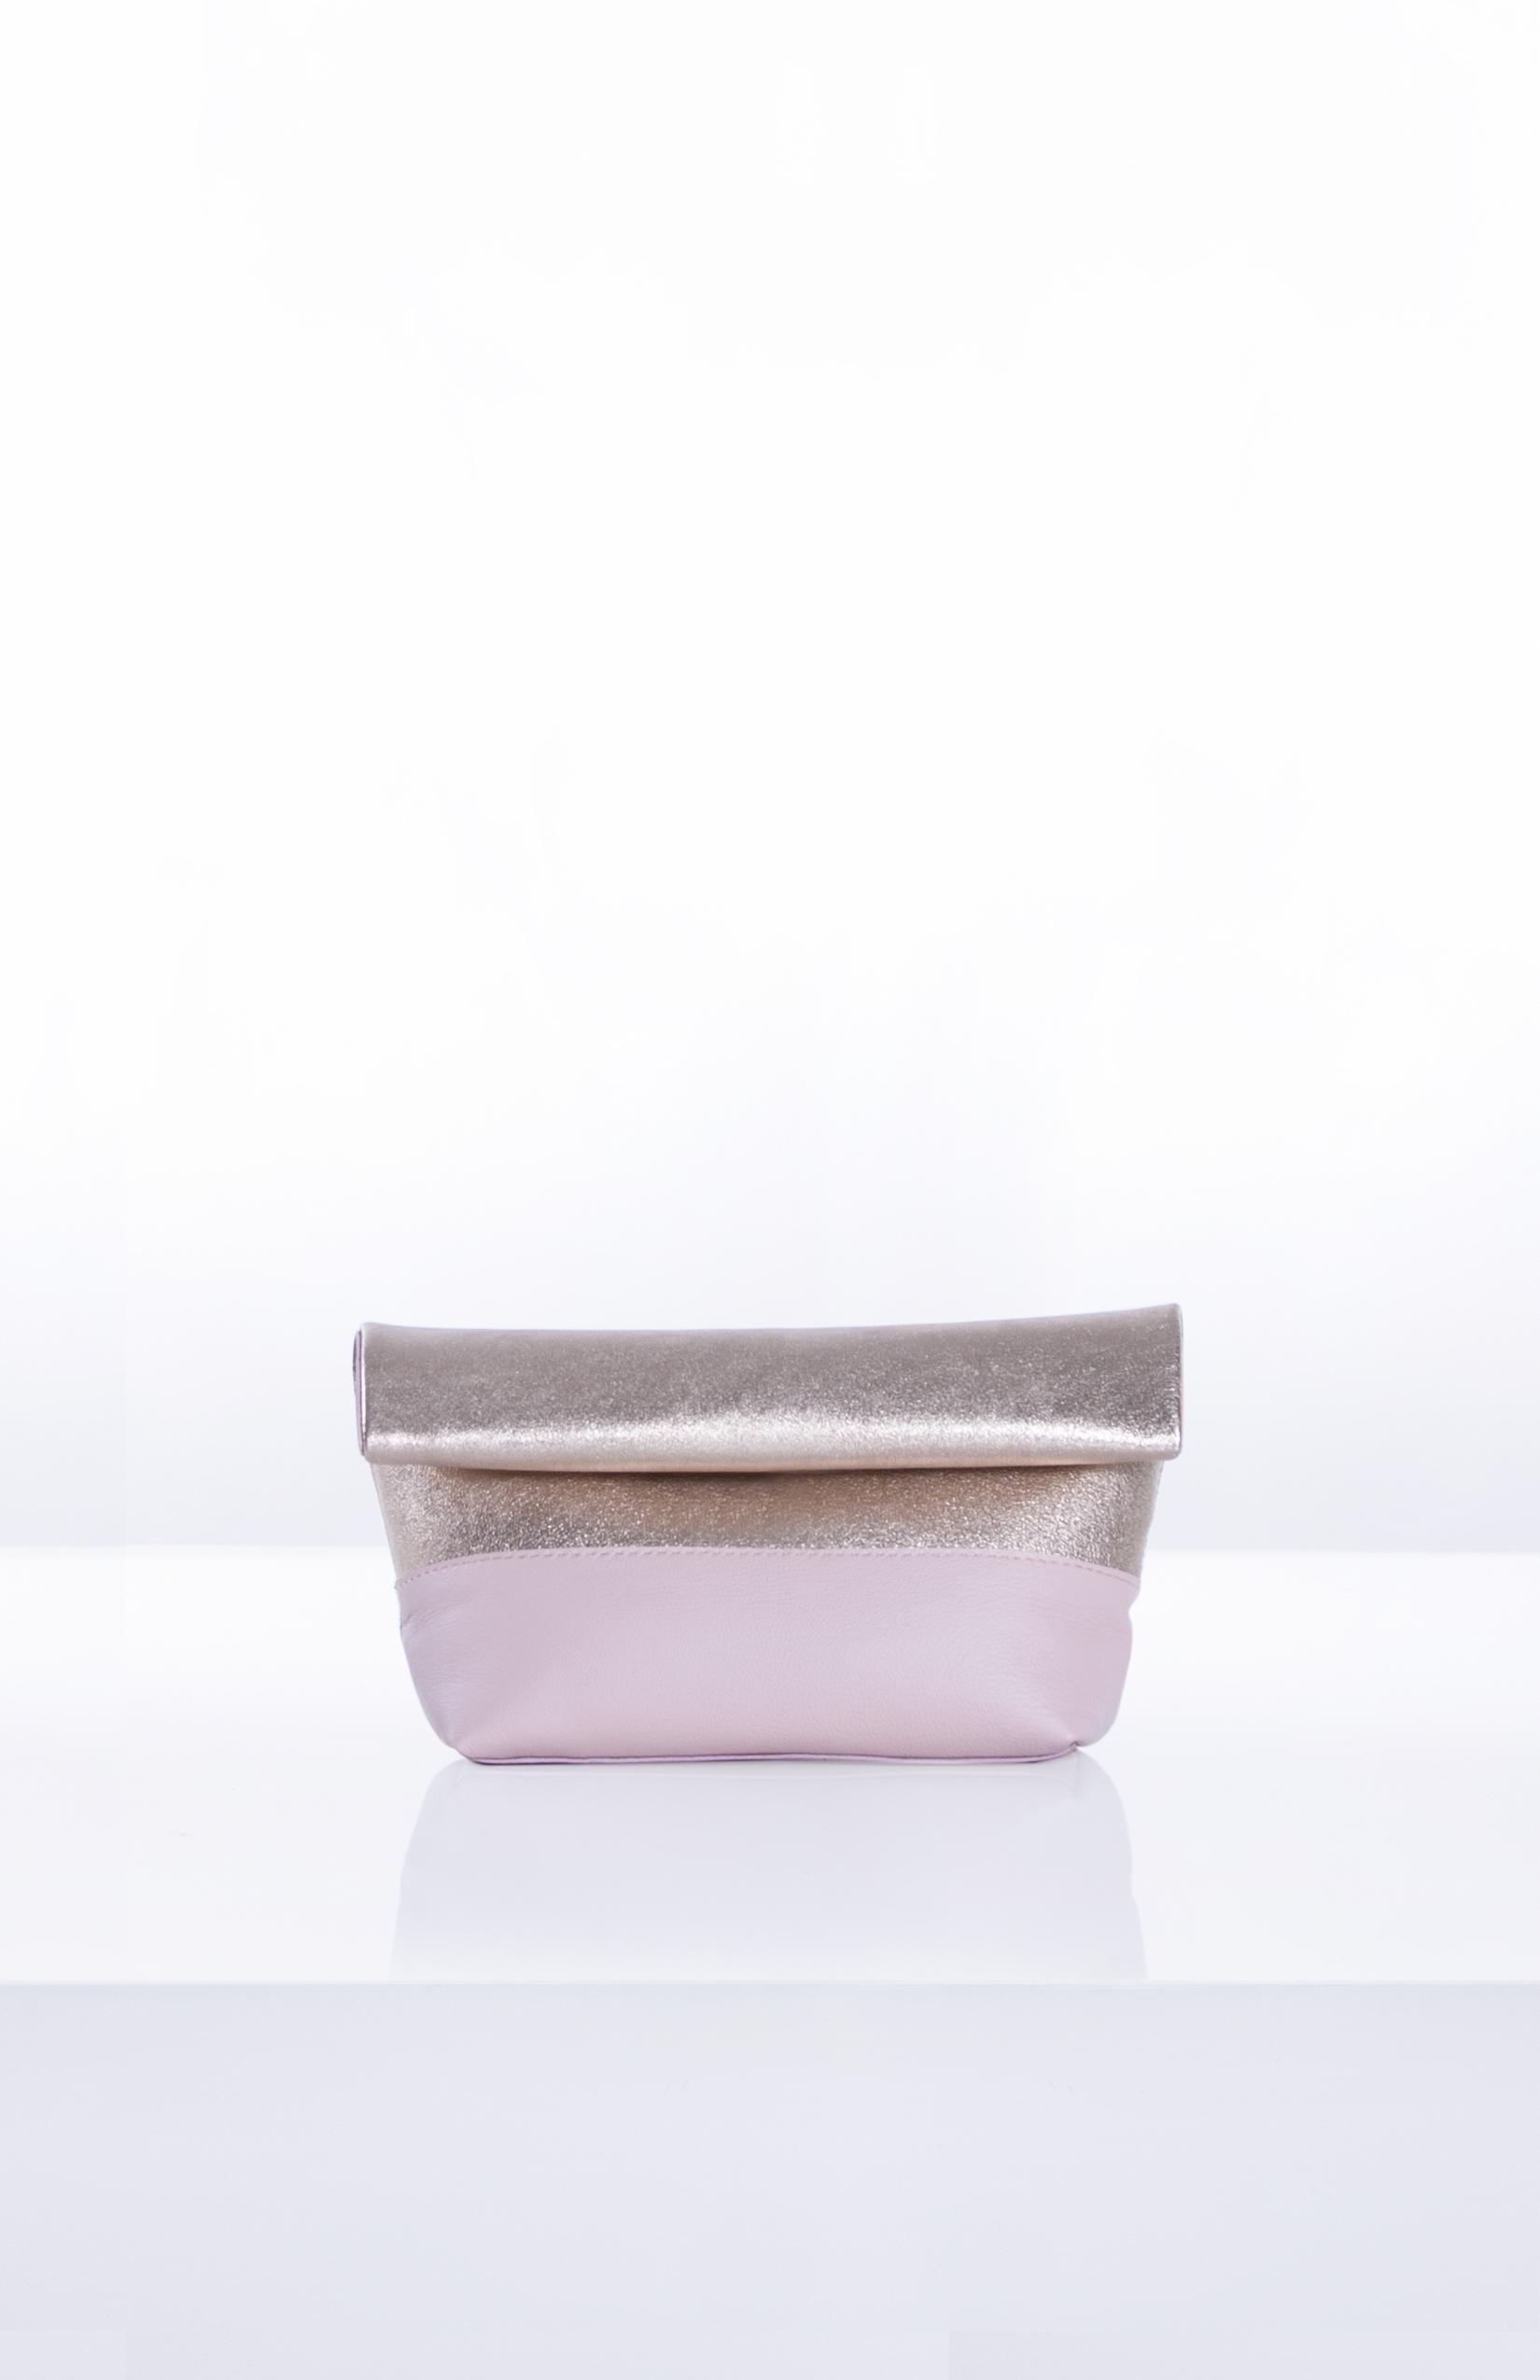 LUNA ROLLDOWN CLUTCH- Gold + Blush